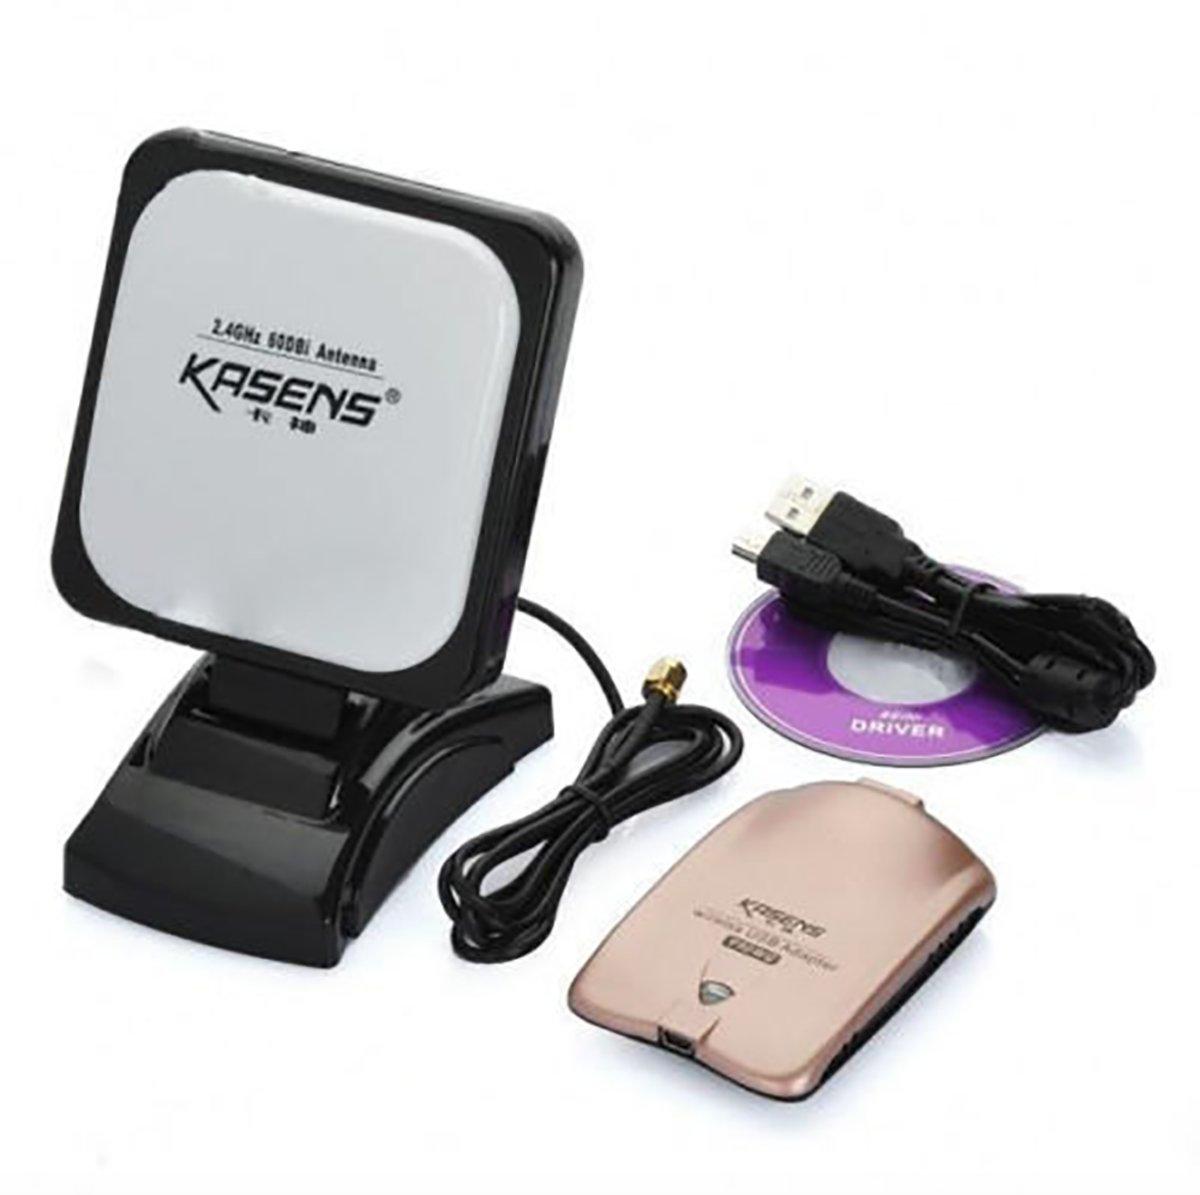 Draadloze USB adapter 60dBi WIRELESS 6000MW met antenne BT10